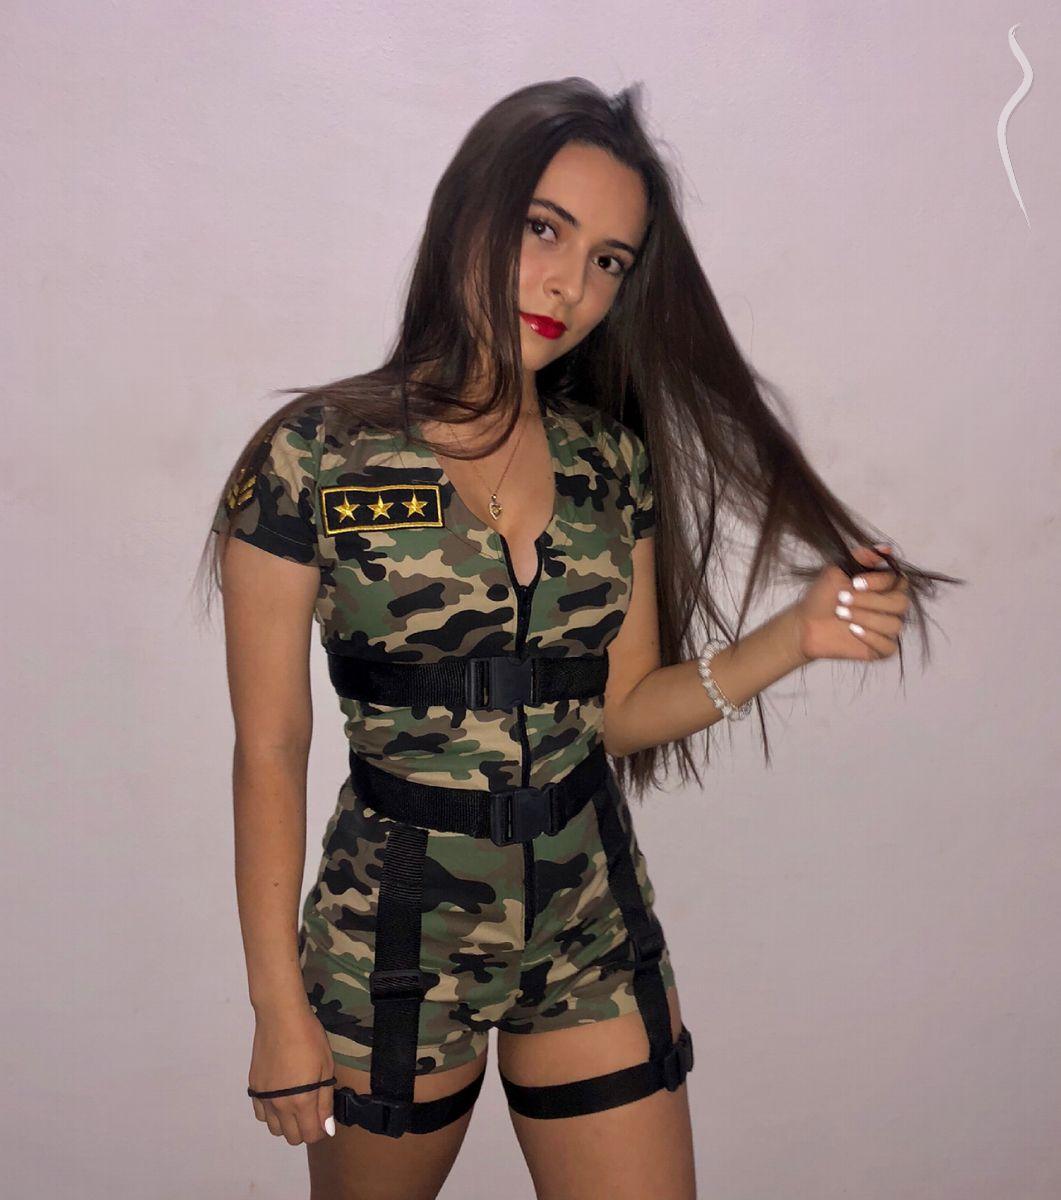 Tani Models In 2019: Tani Sirka - A Model From Argentina